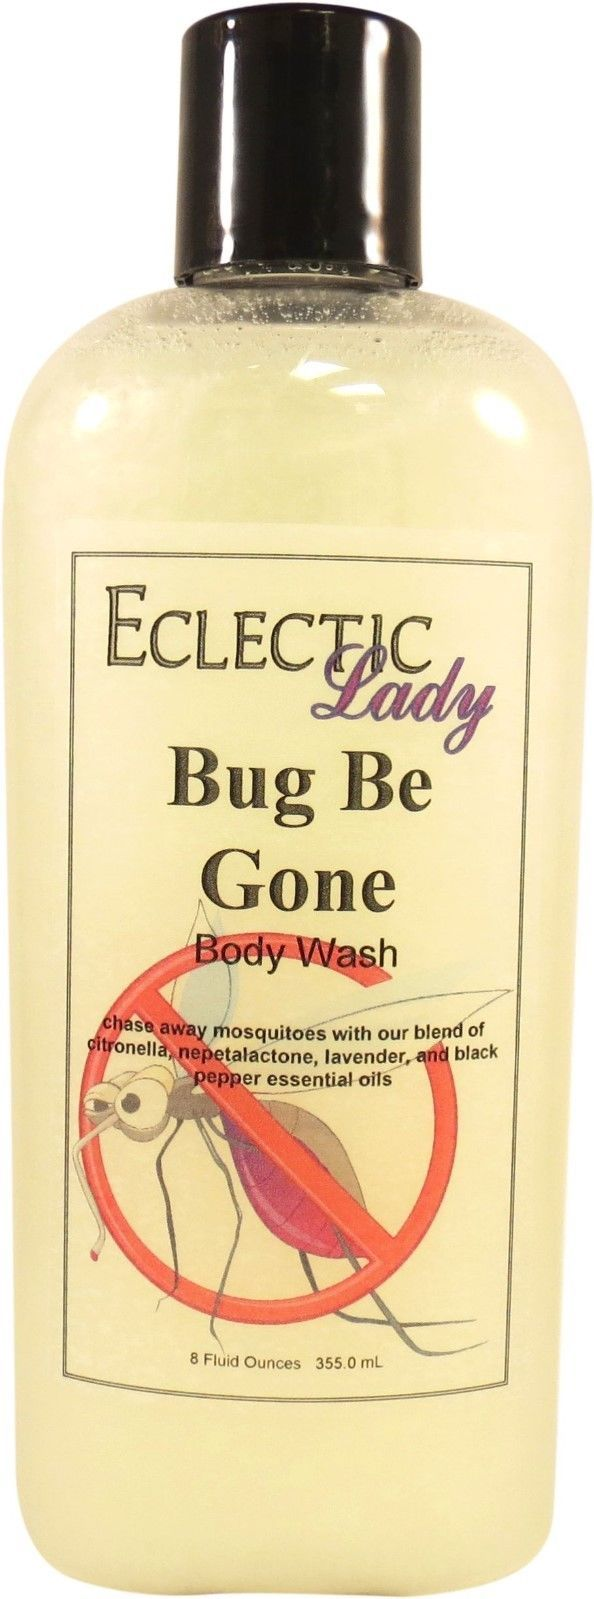 Bug Be Gone Essential Oil Blend Body Wash